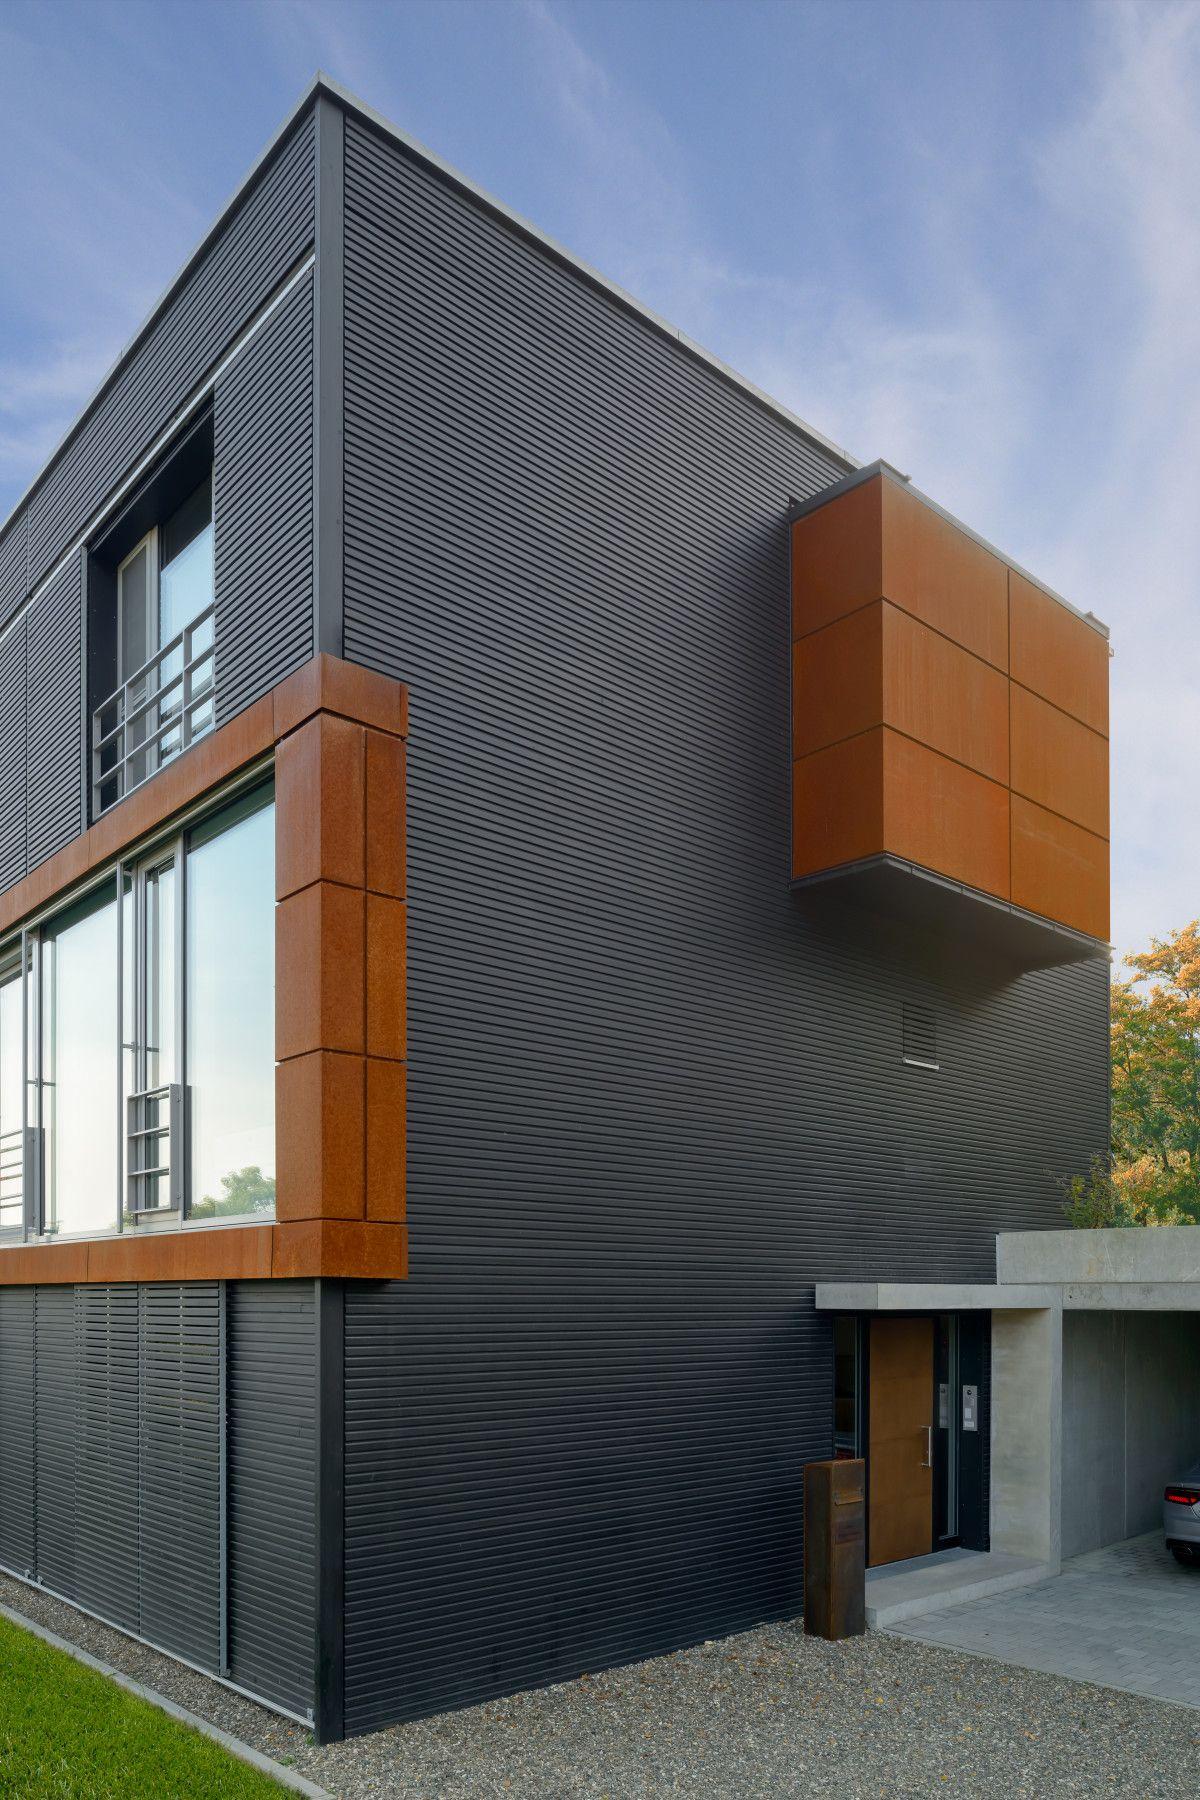 Fassade Architektur architektur detail fassade haus pawliczec baufritz holzfassade